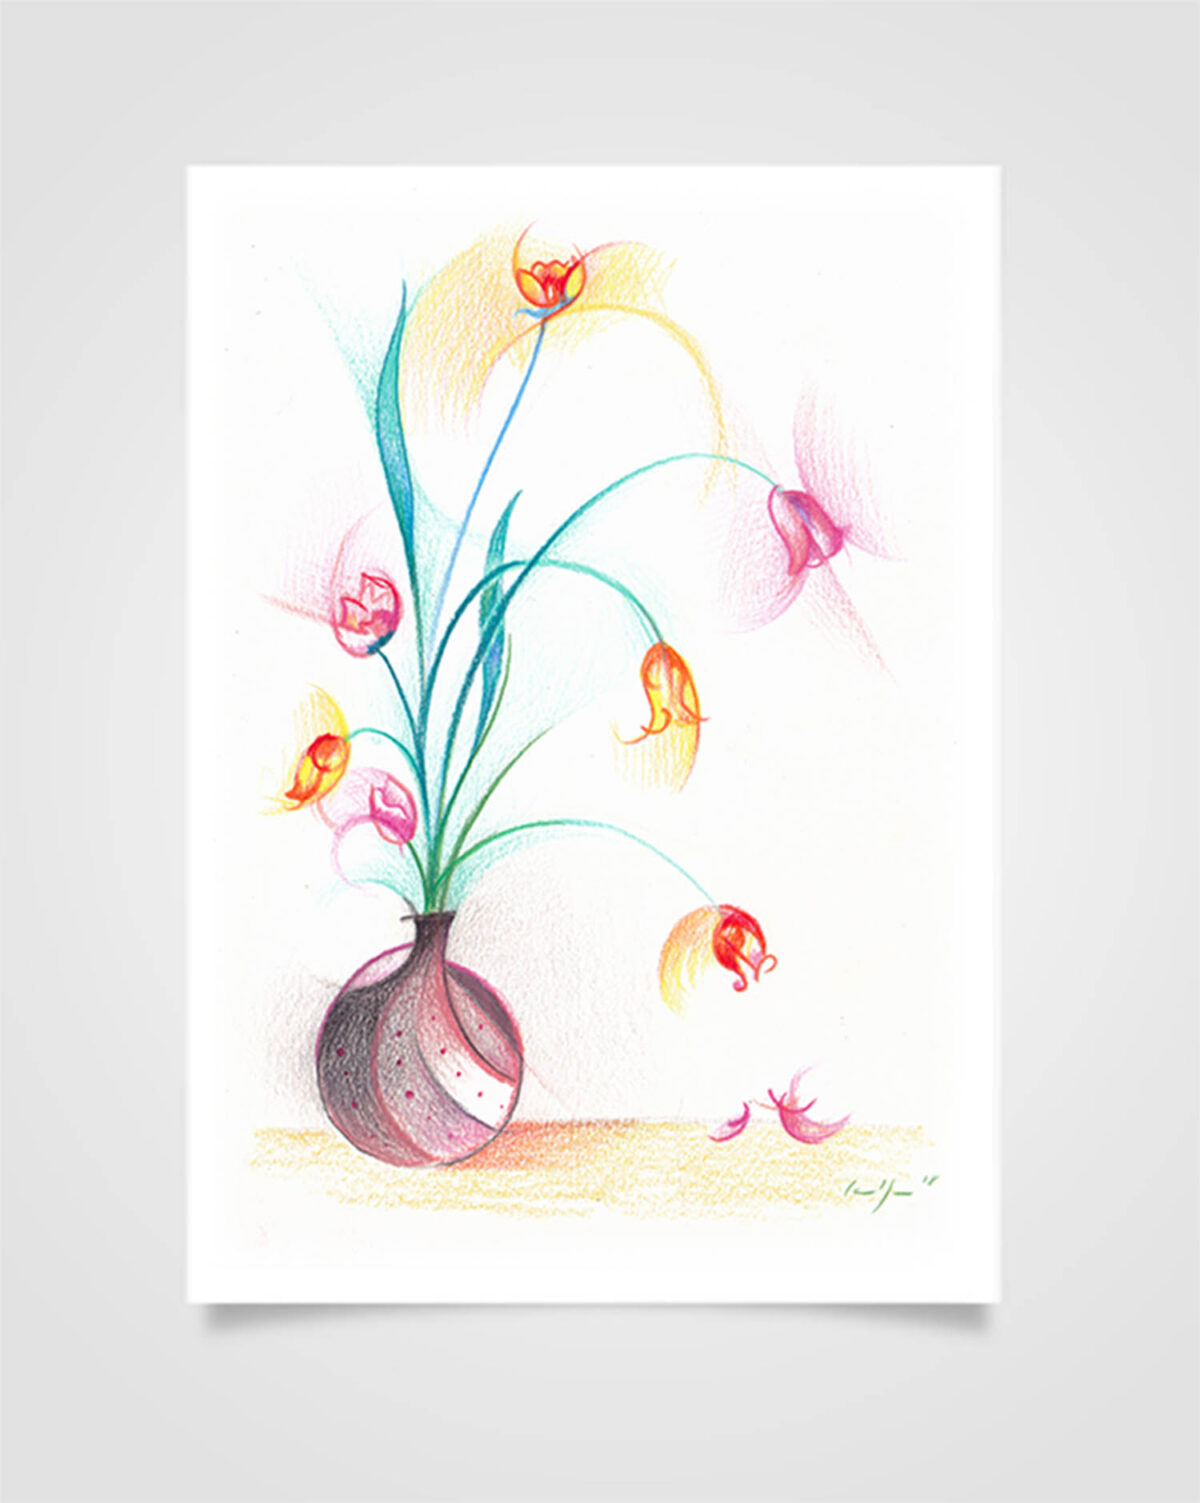 """Flora - Campanelle"" Pastelli su carta, 14,8 x 21cm"